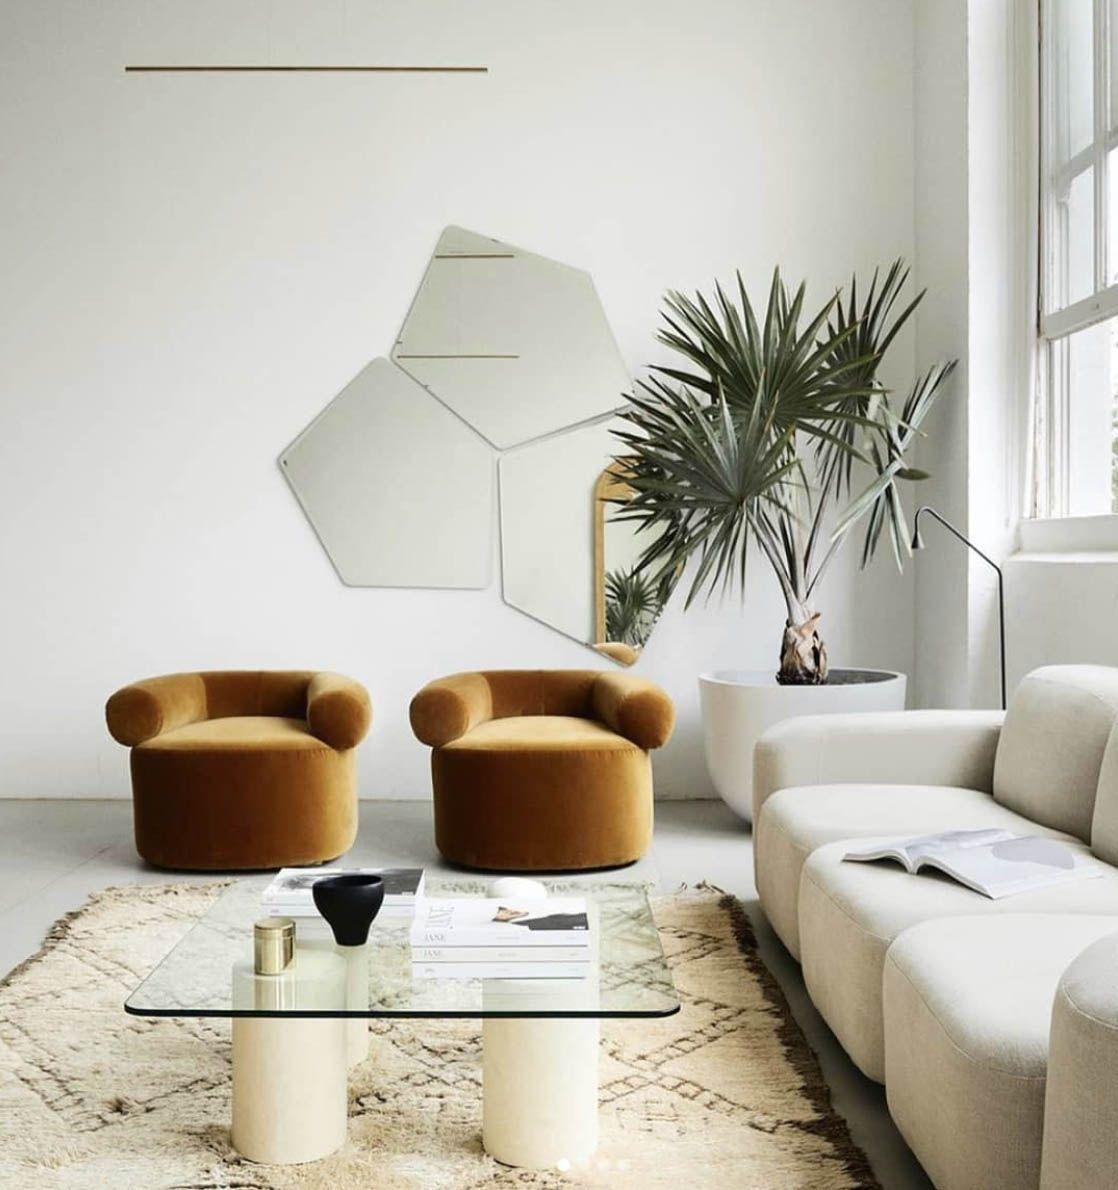 Interior, House Interior, Luxury Homes